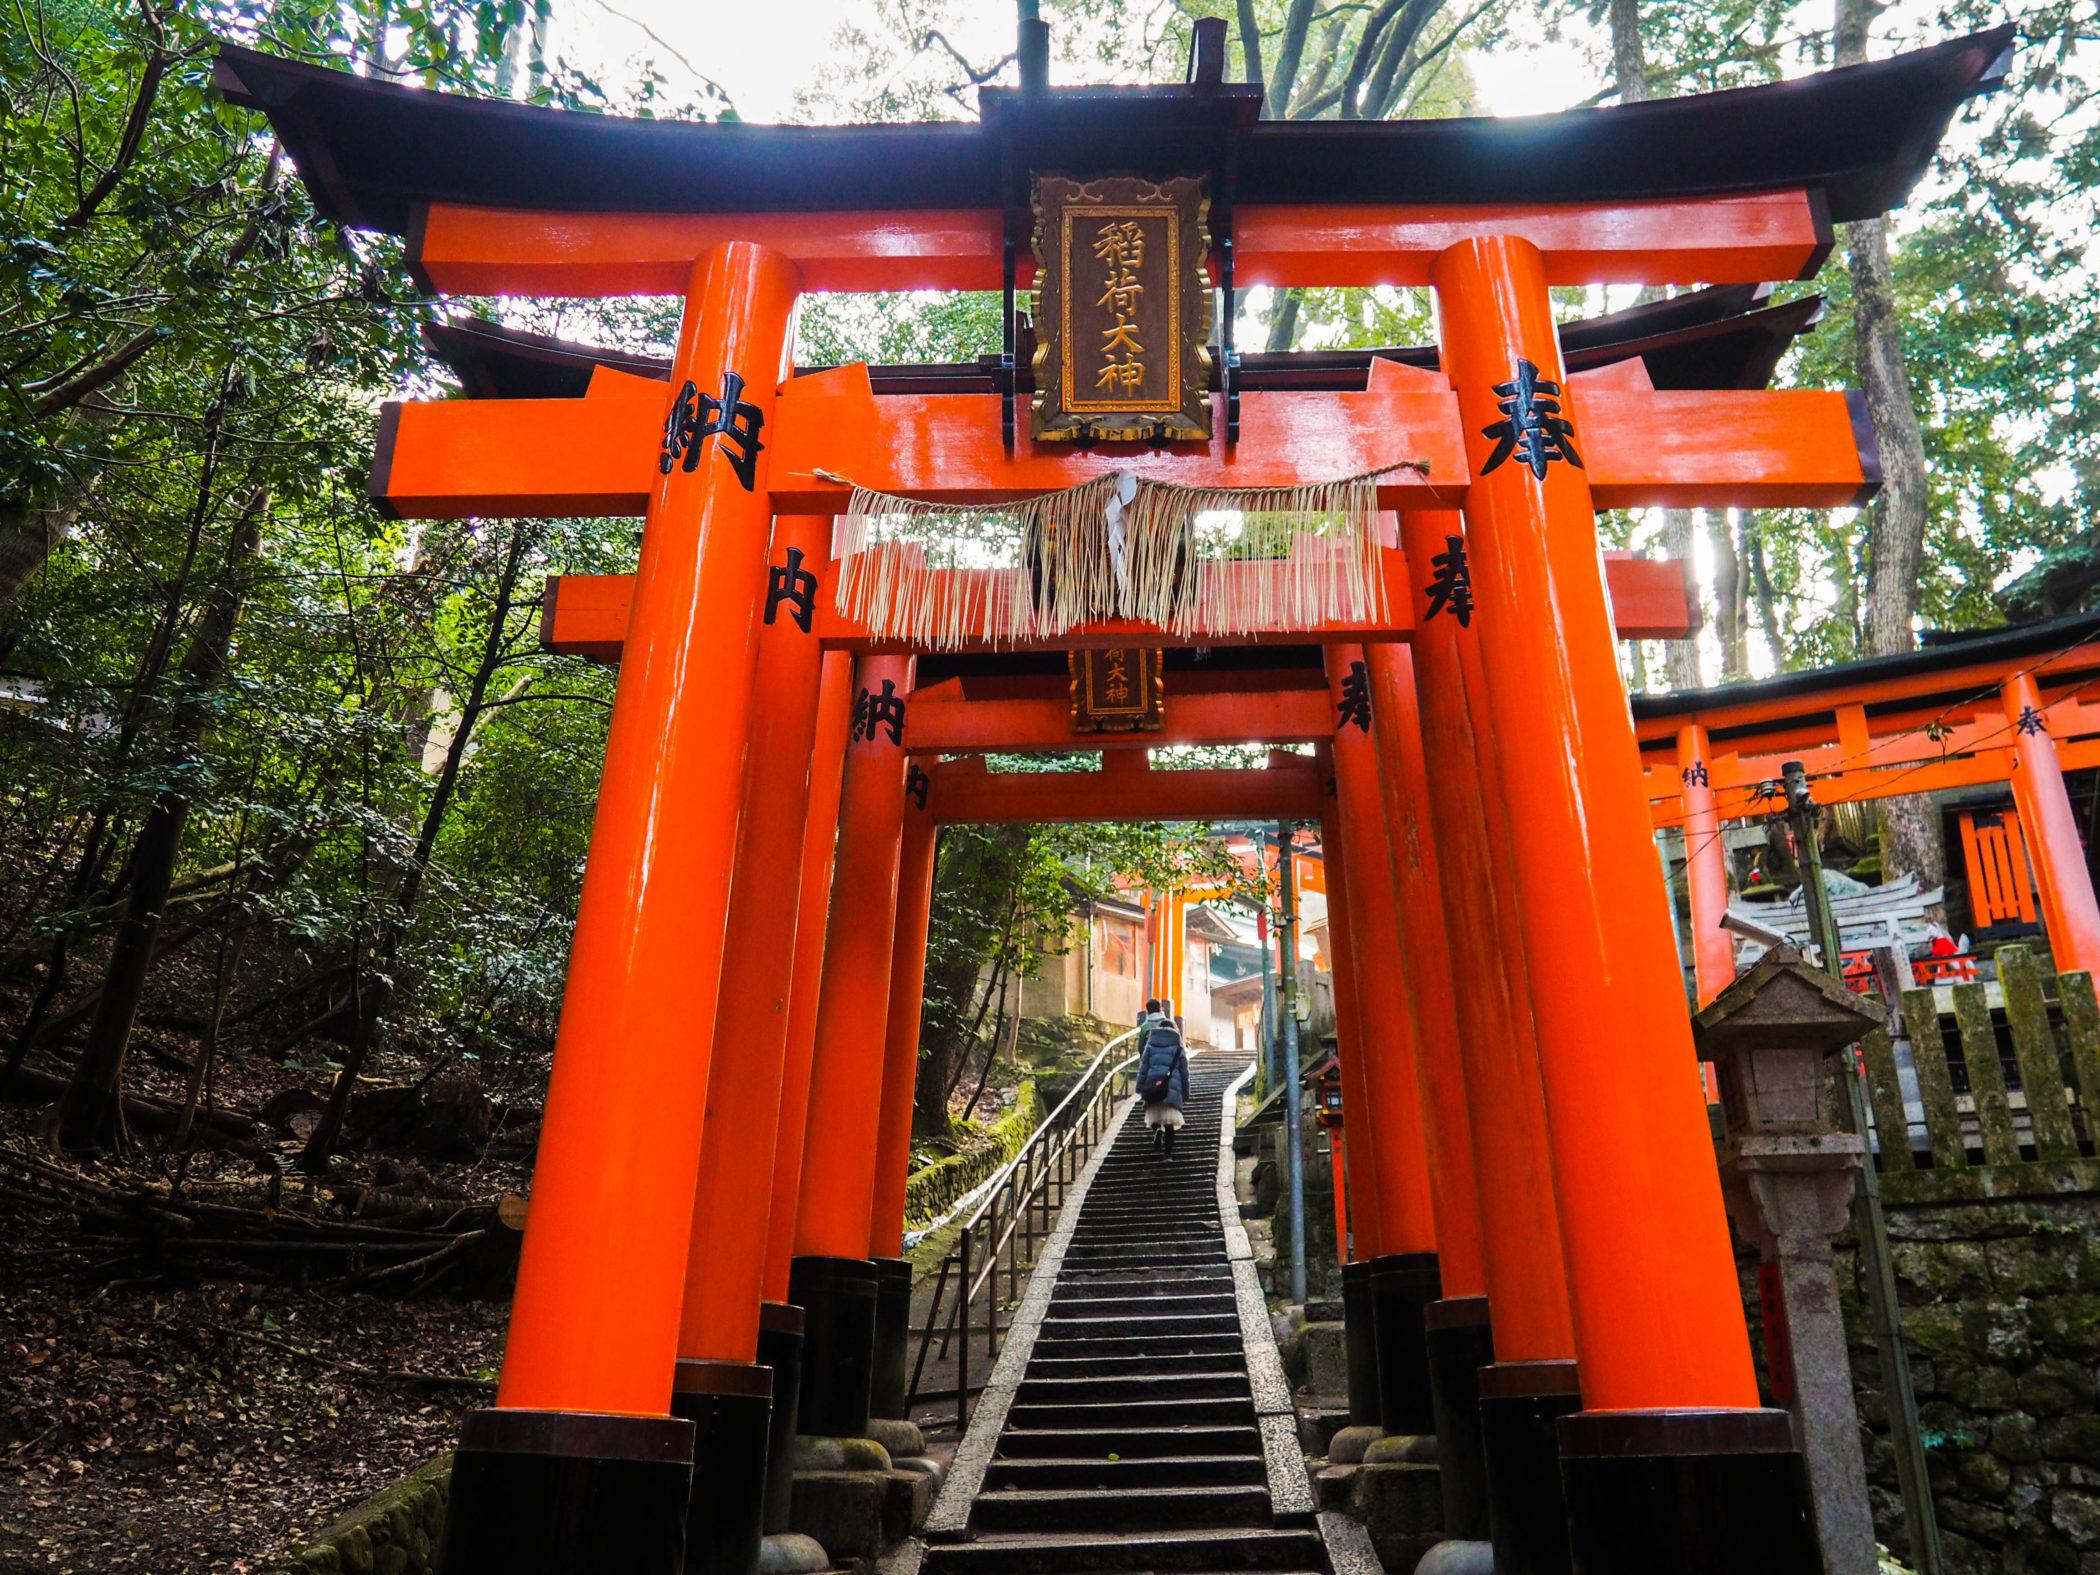 Japan-Kyoto-Fushimi-Inari-Tori-Gates